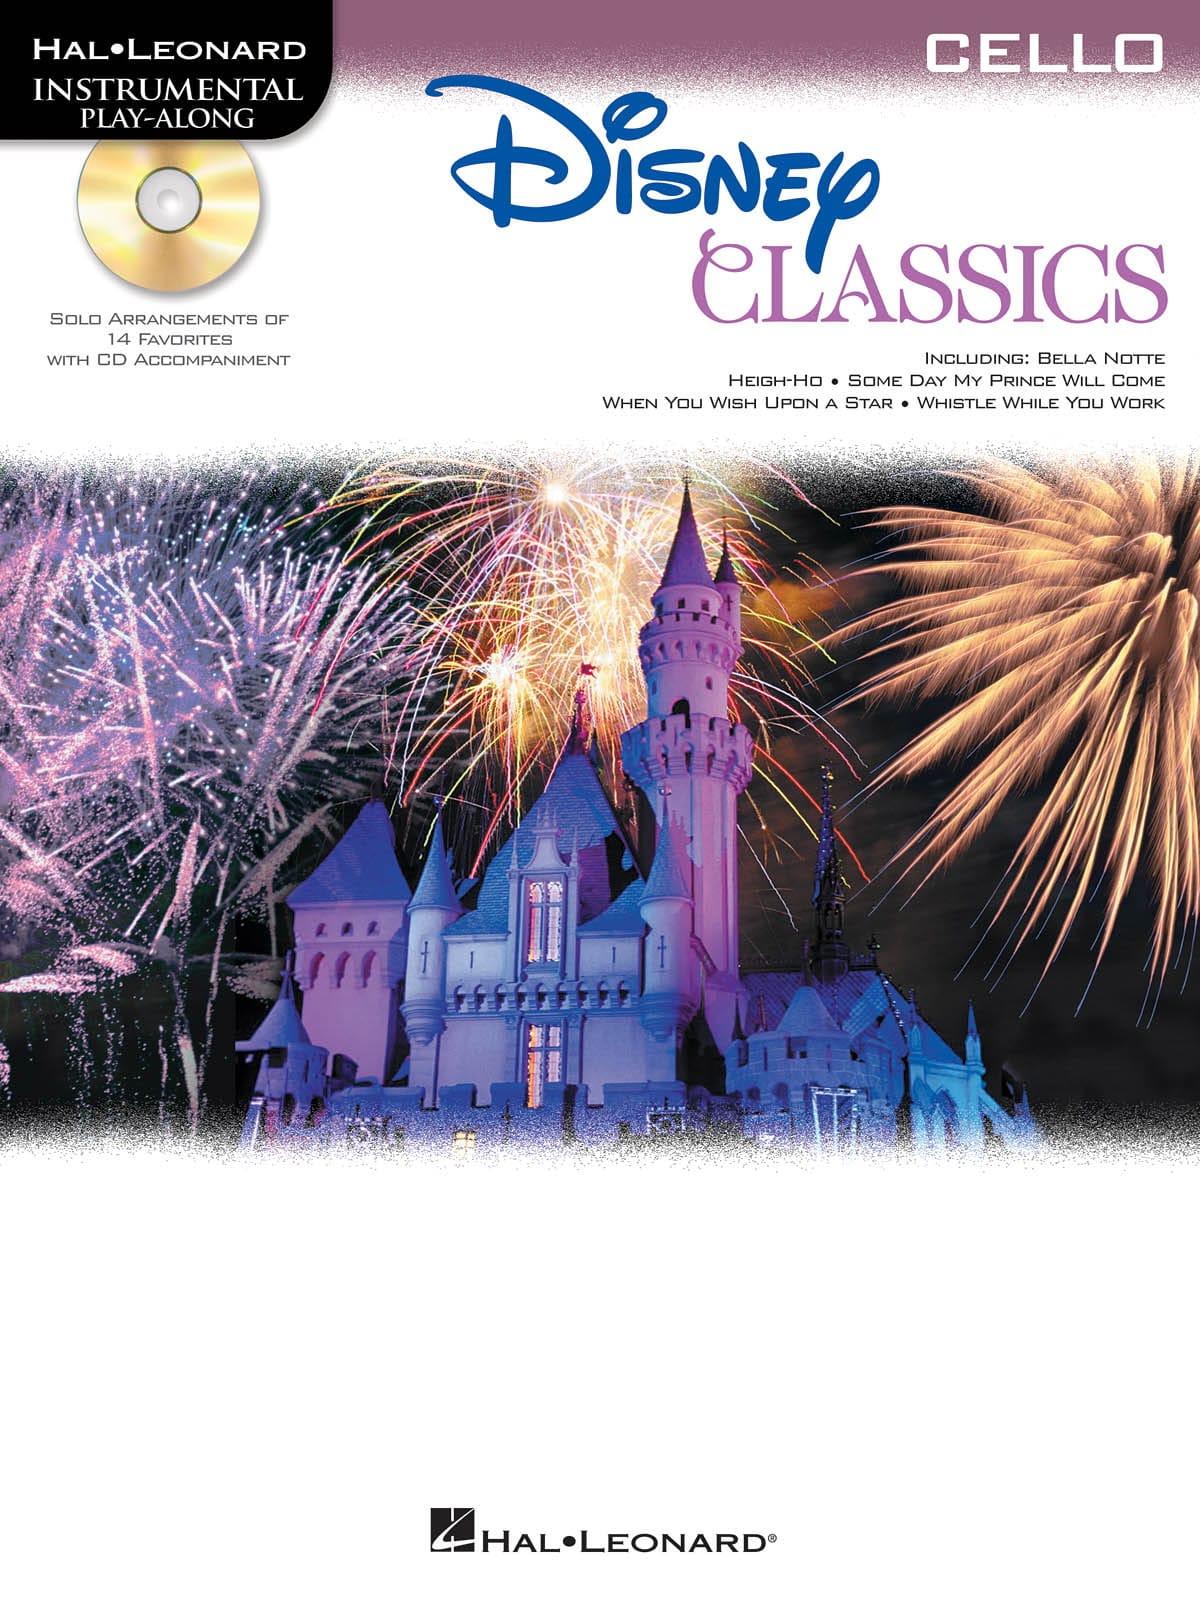 DISNEY - Disney Classics - Juego instrumental a lo largo - Partition - di-arezzo.es